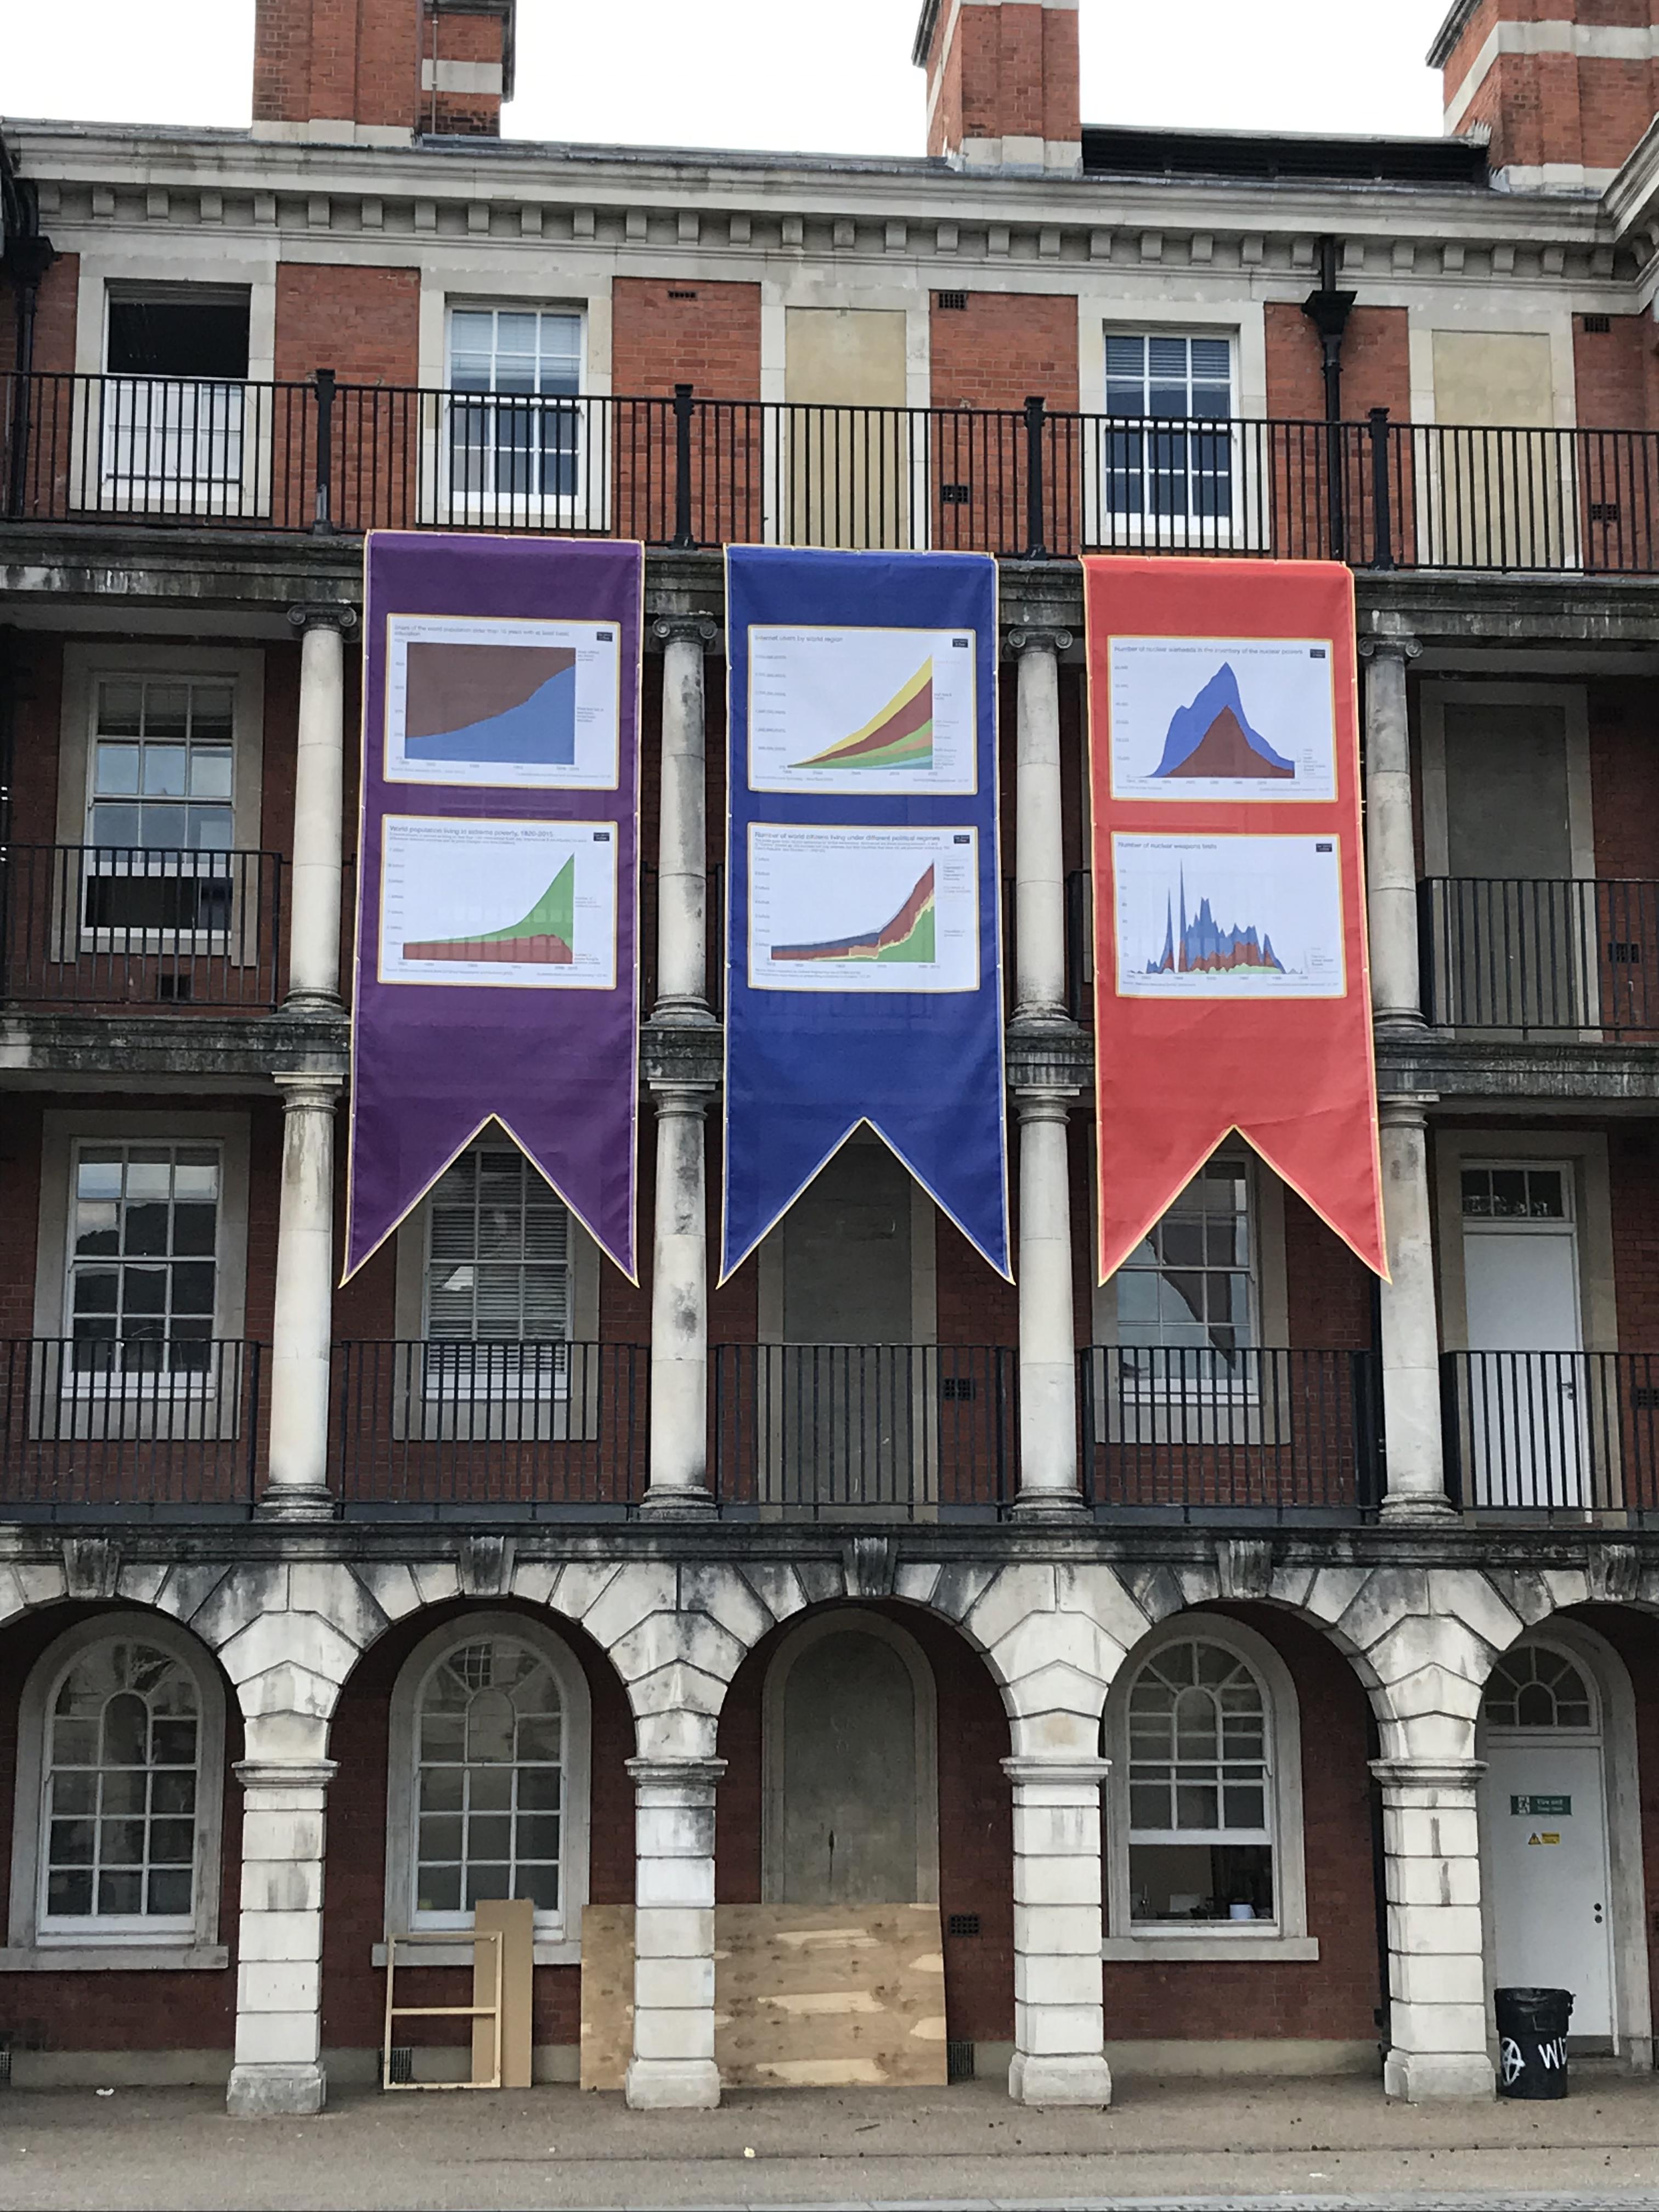 'Virtutis Praemium: the reward of virtue', an installation using heraldic banners, flags, buntings and postcards